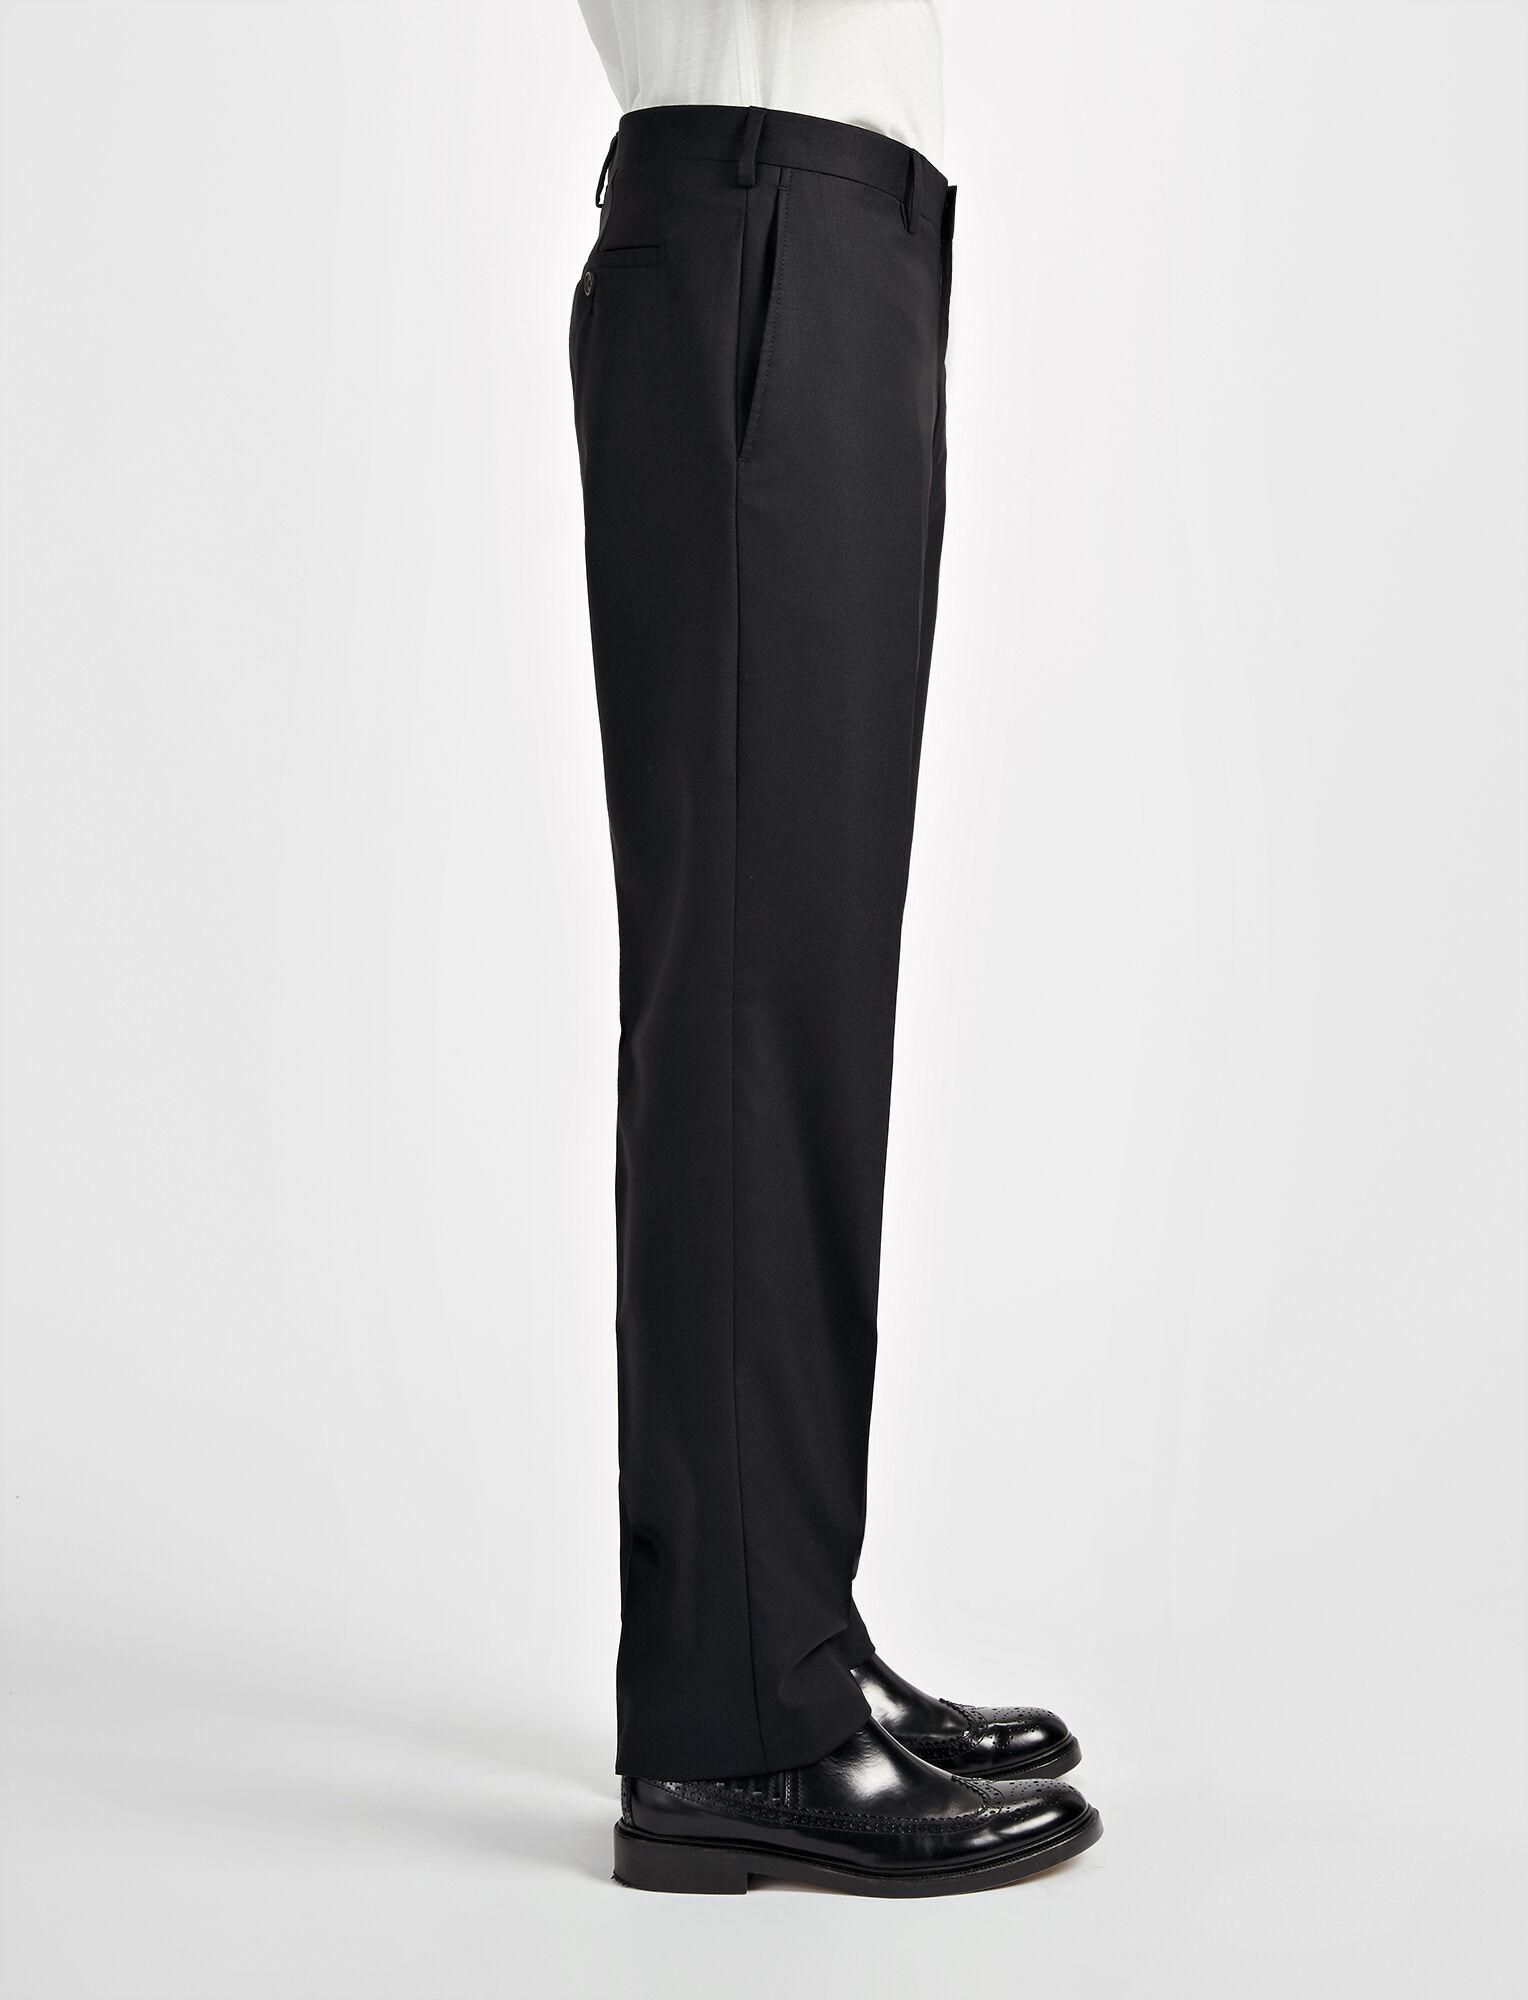 Joseph, Pantalon de costume Darwin en laine tropicale, in BLACK